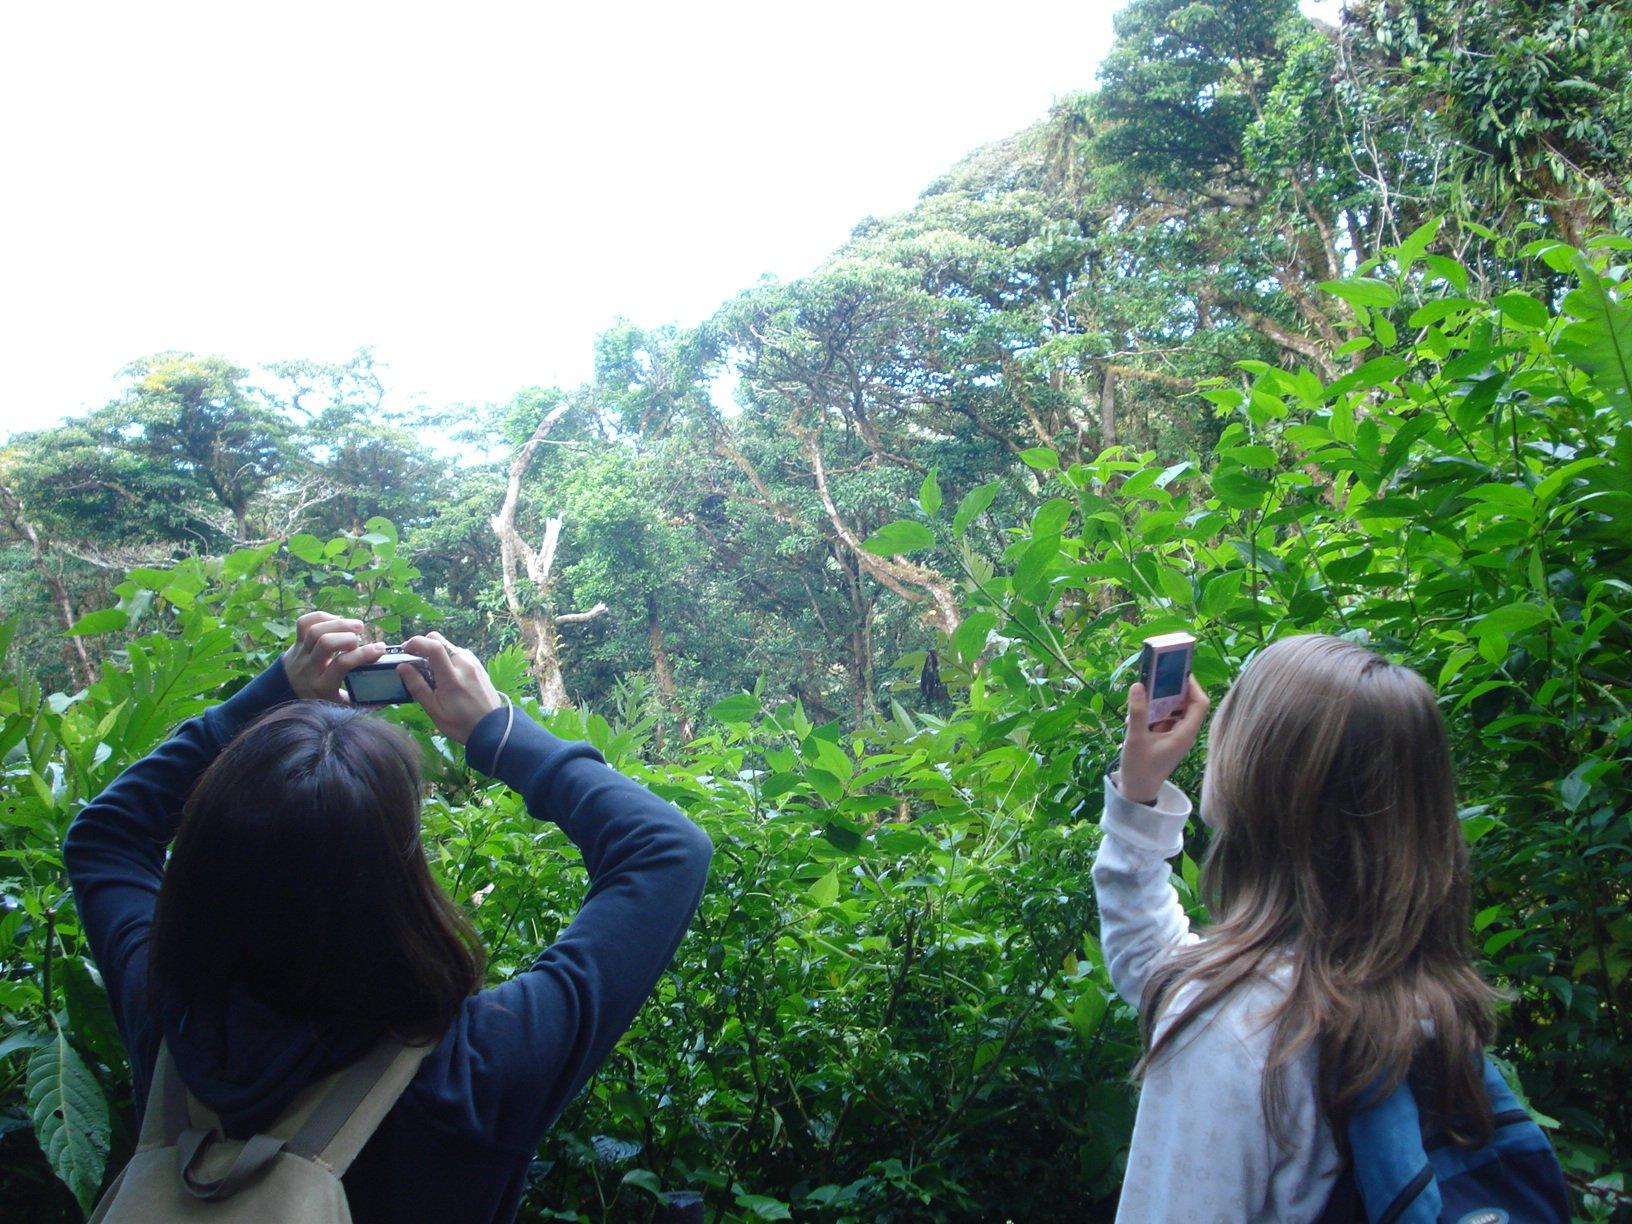 South-America_Costa Rica_Youth_jungle